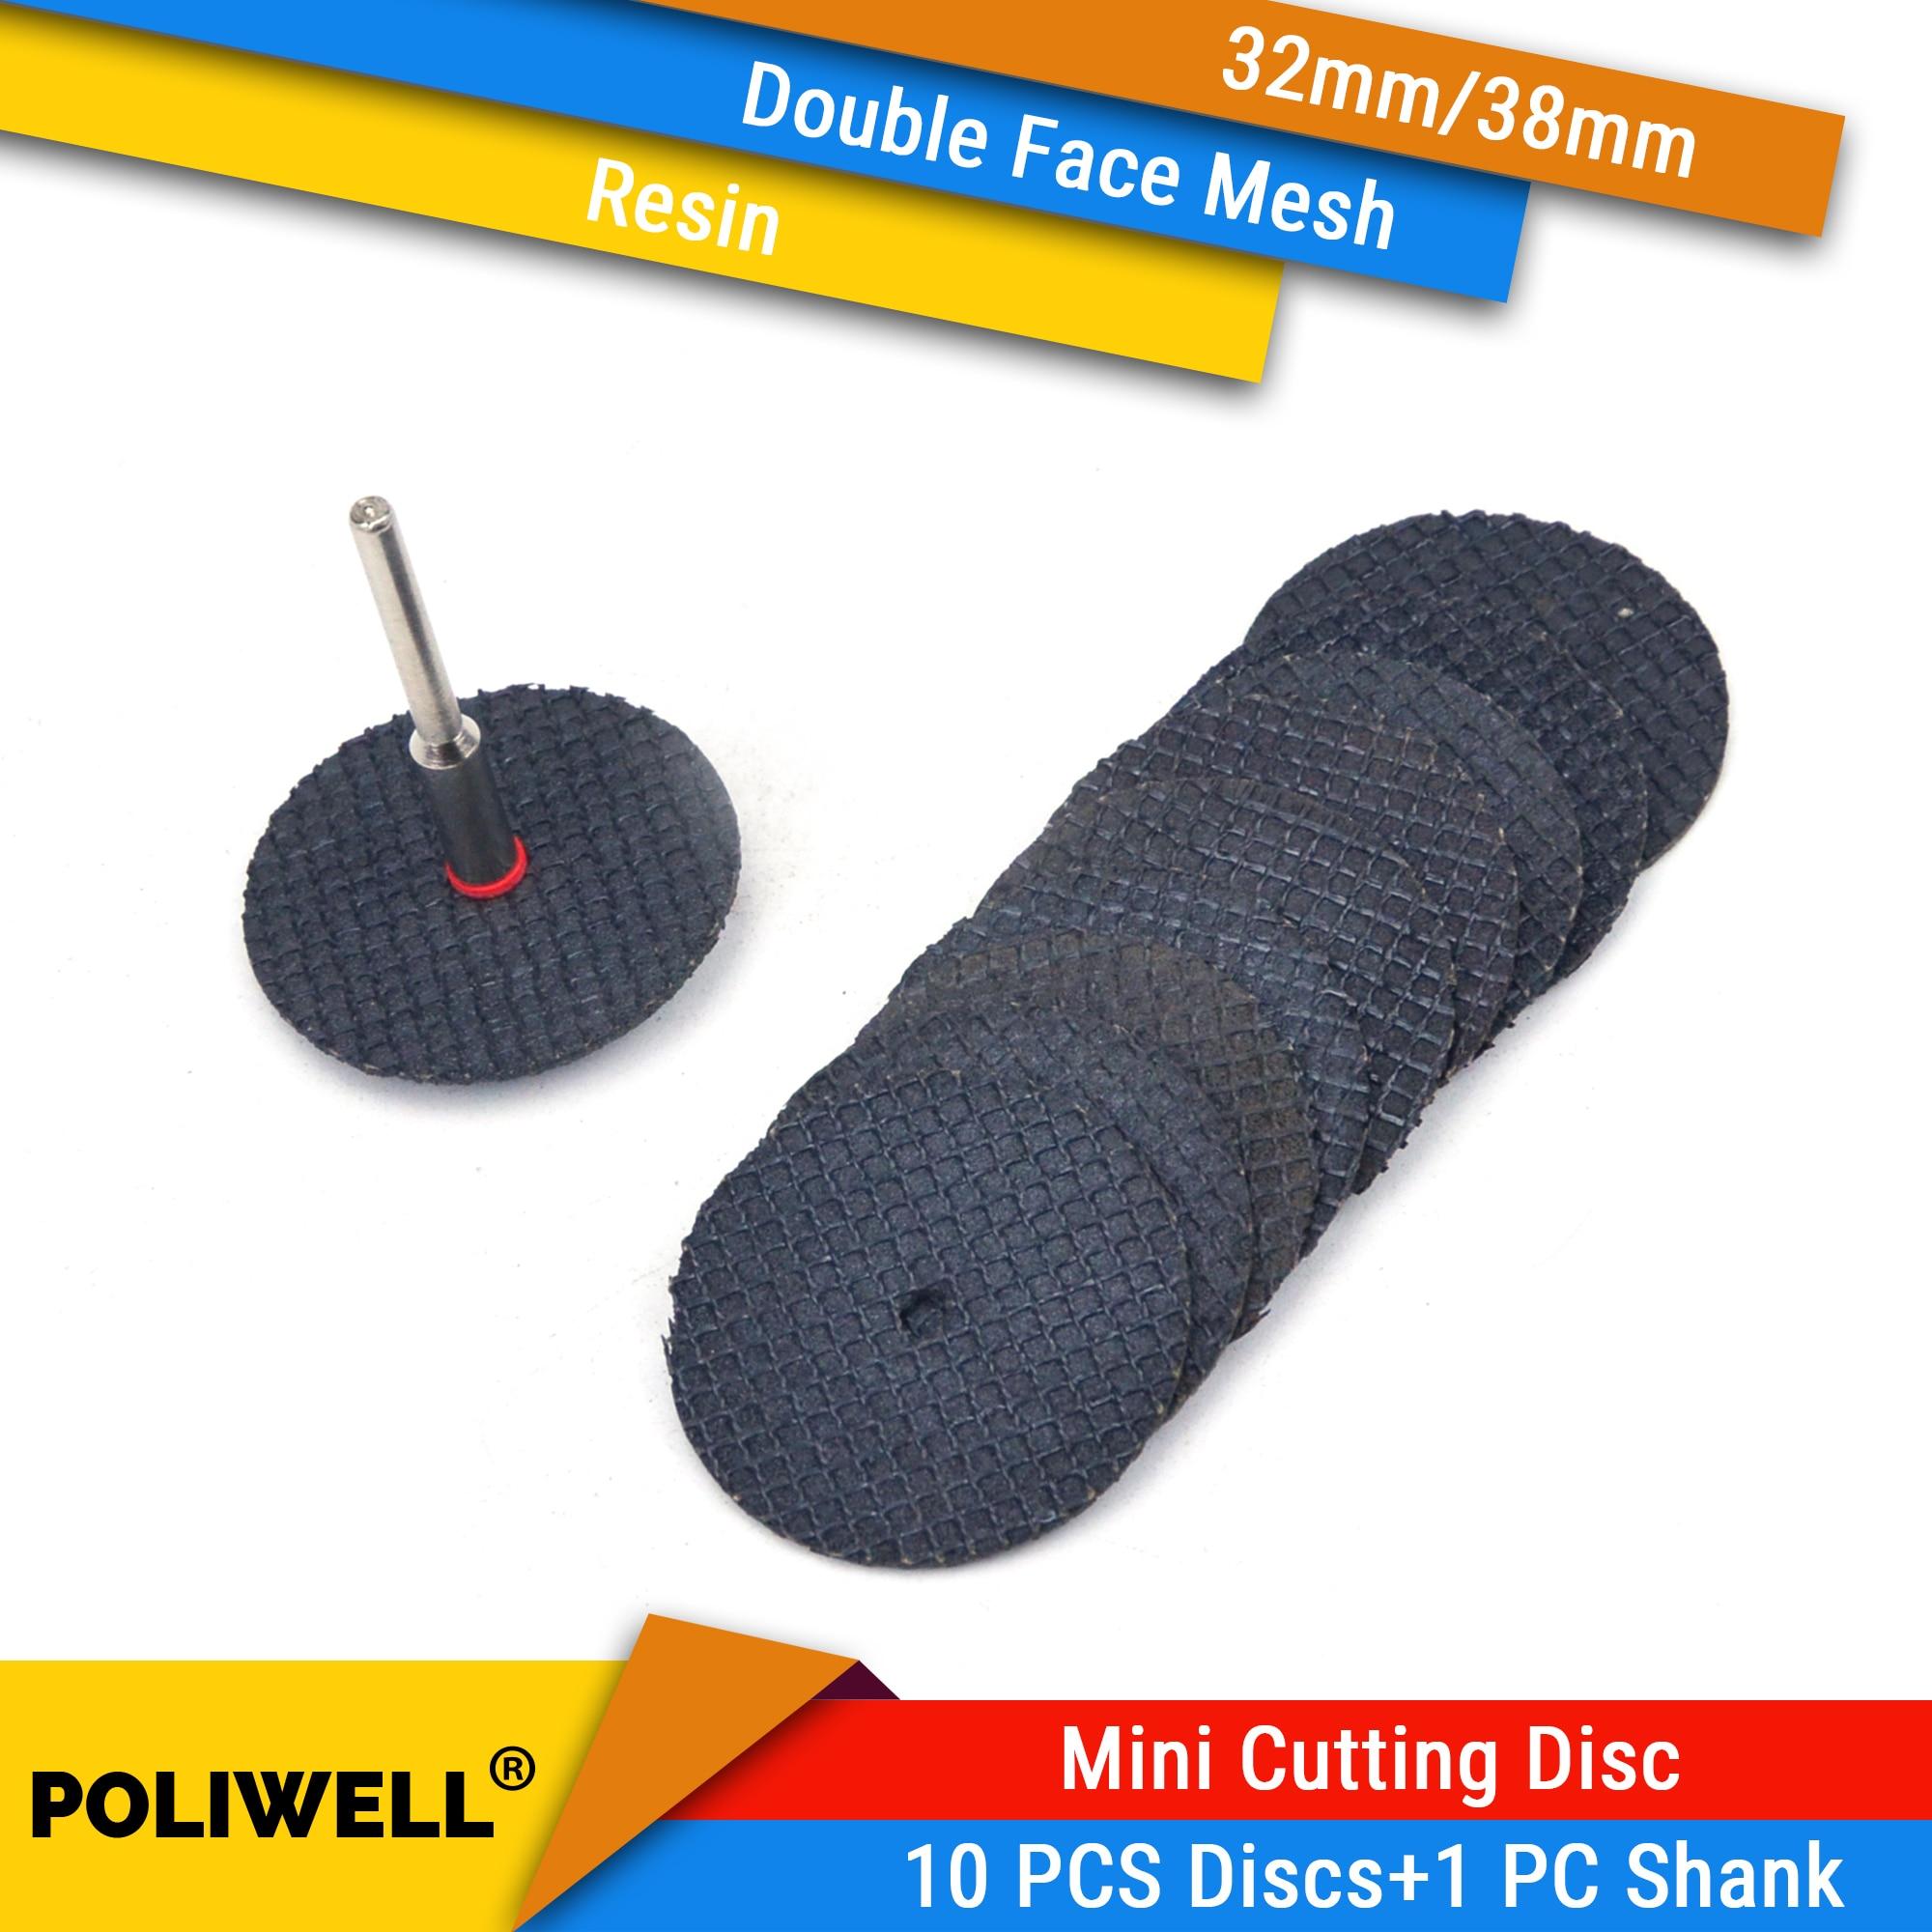 10Pcs Double-Face Mesh Cutting Disc + 1Pc 3mm Shank Resin Mini Circular Saw Blade For Soft Metal Wood Cutting Fits Dremel Tools